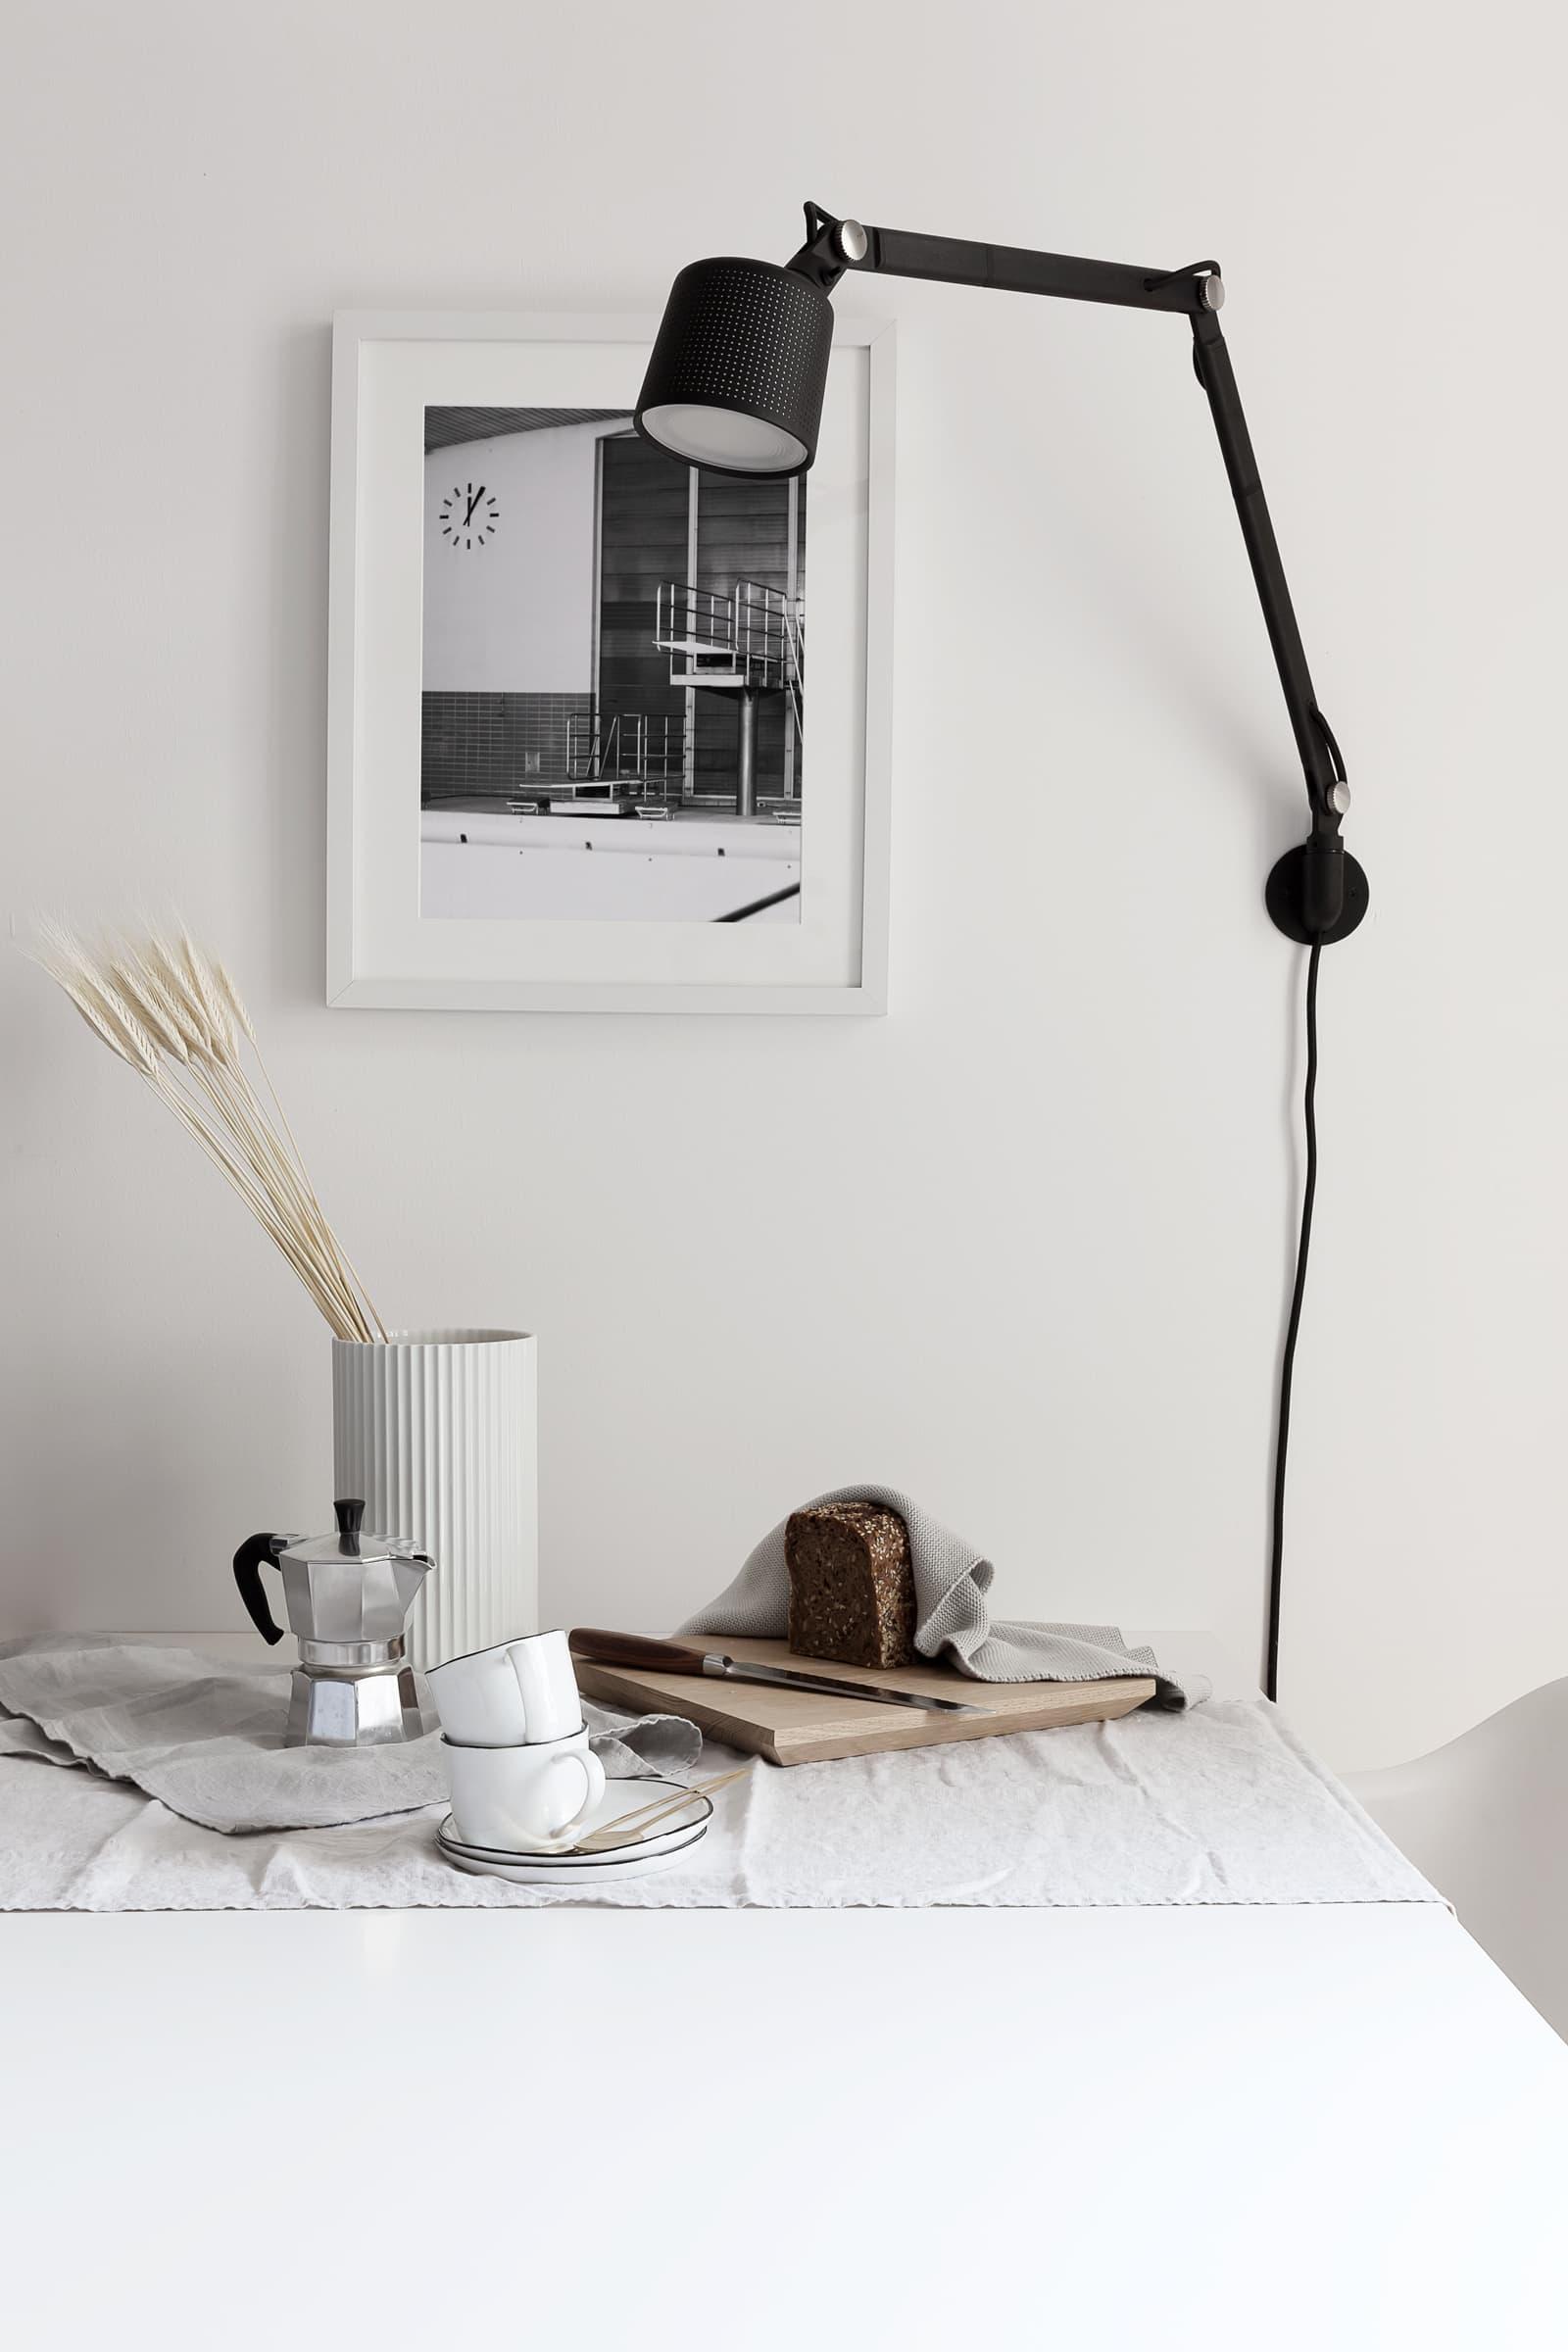 Around Our Home Coco Lapine Designcoco Design